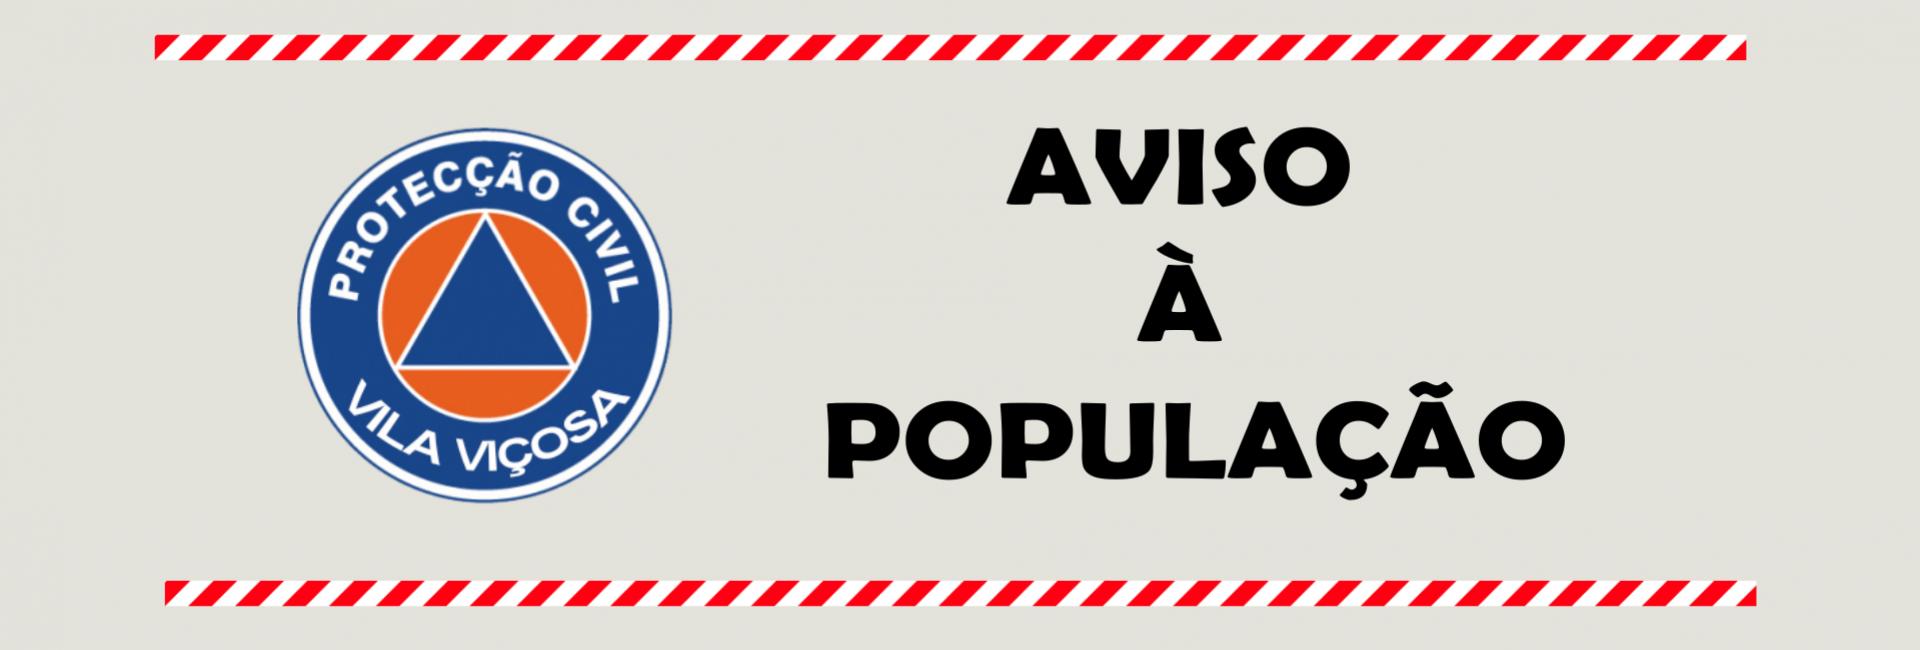 aviso_populacao_prociv